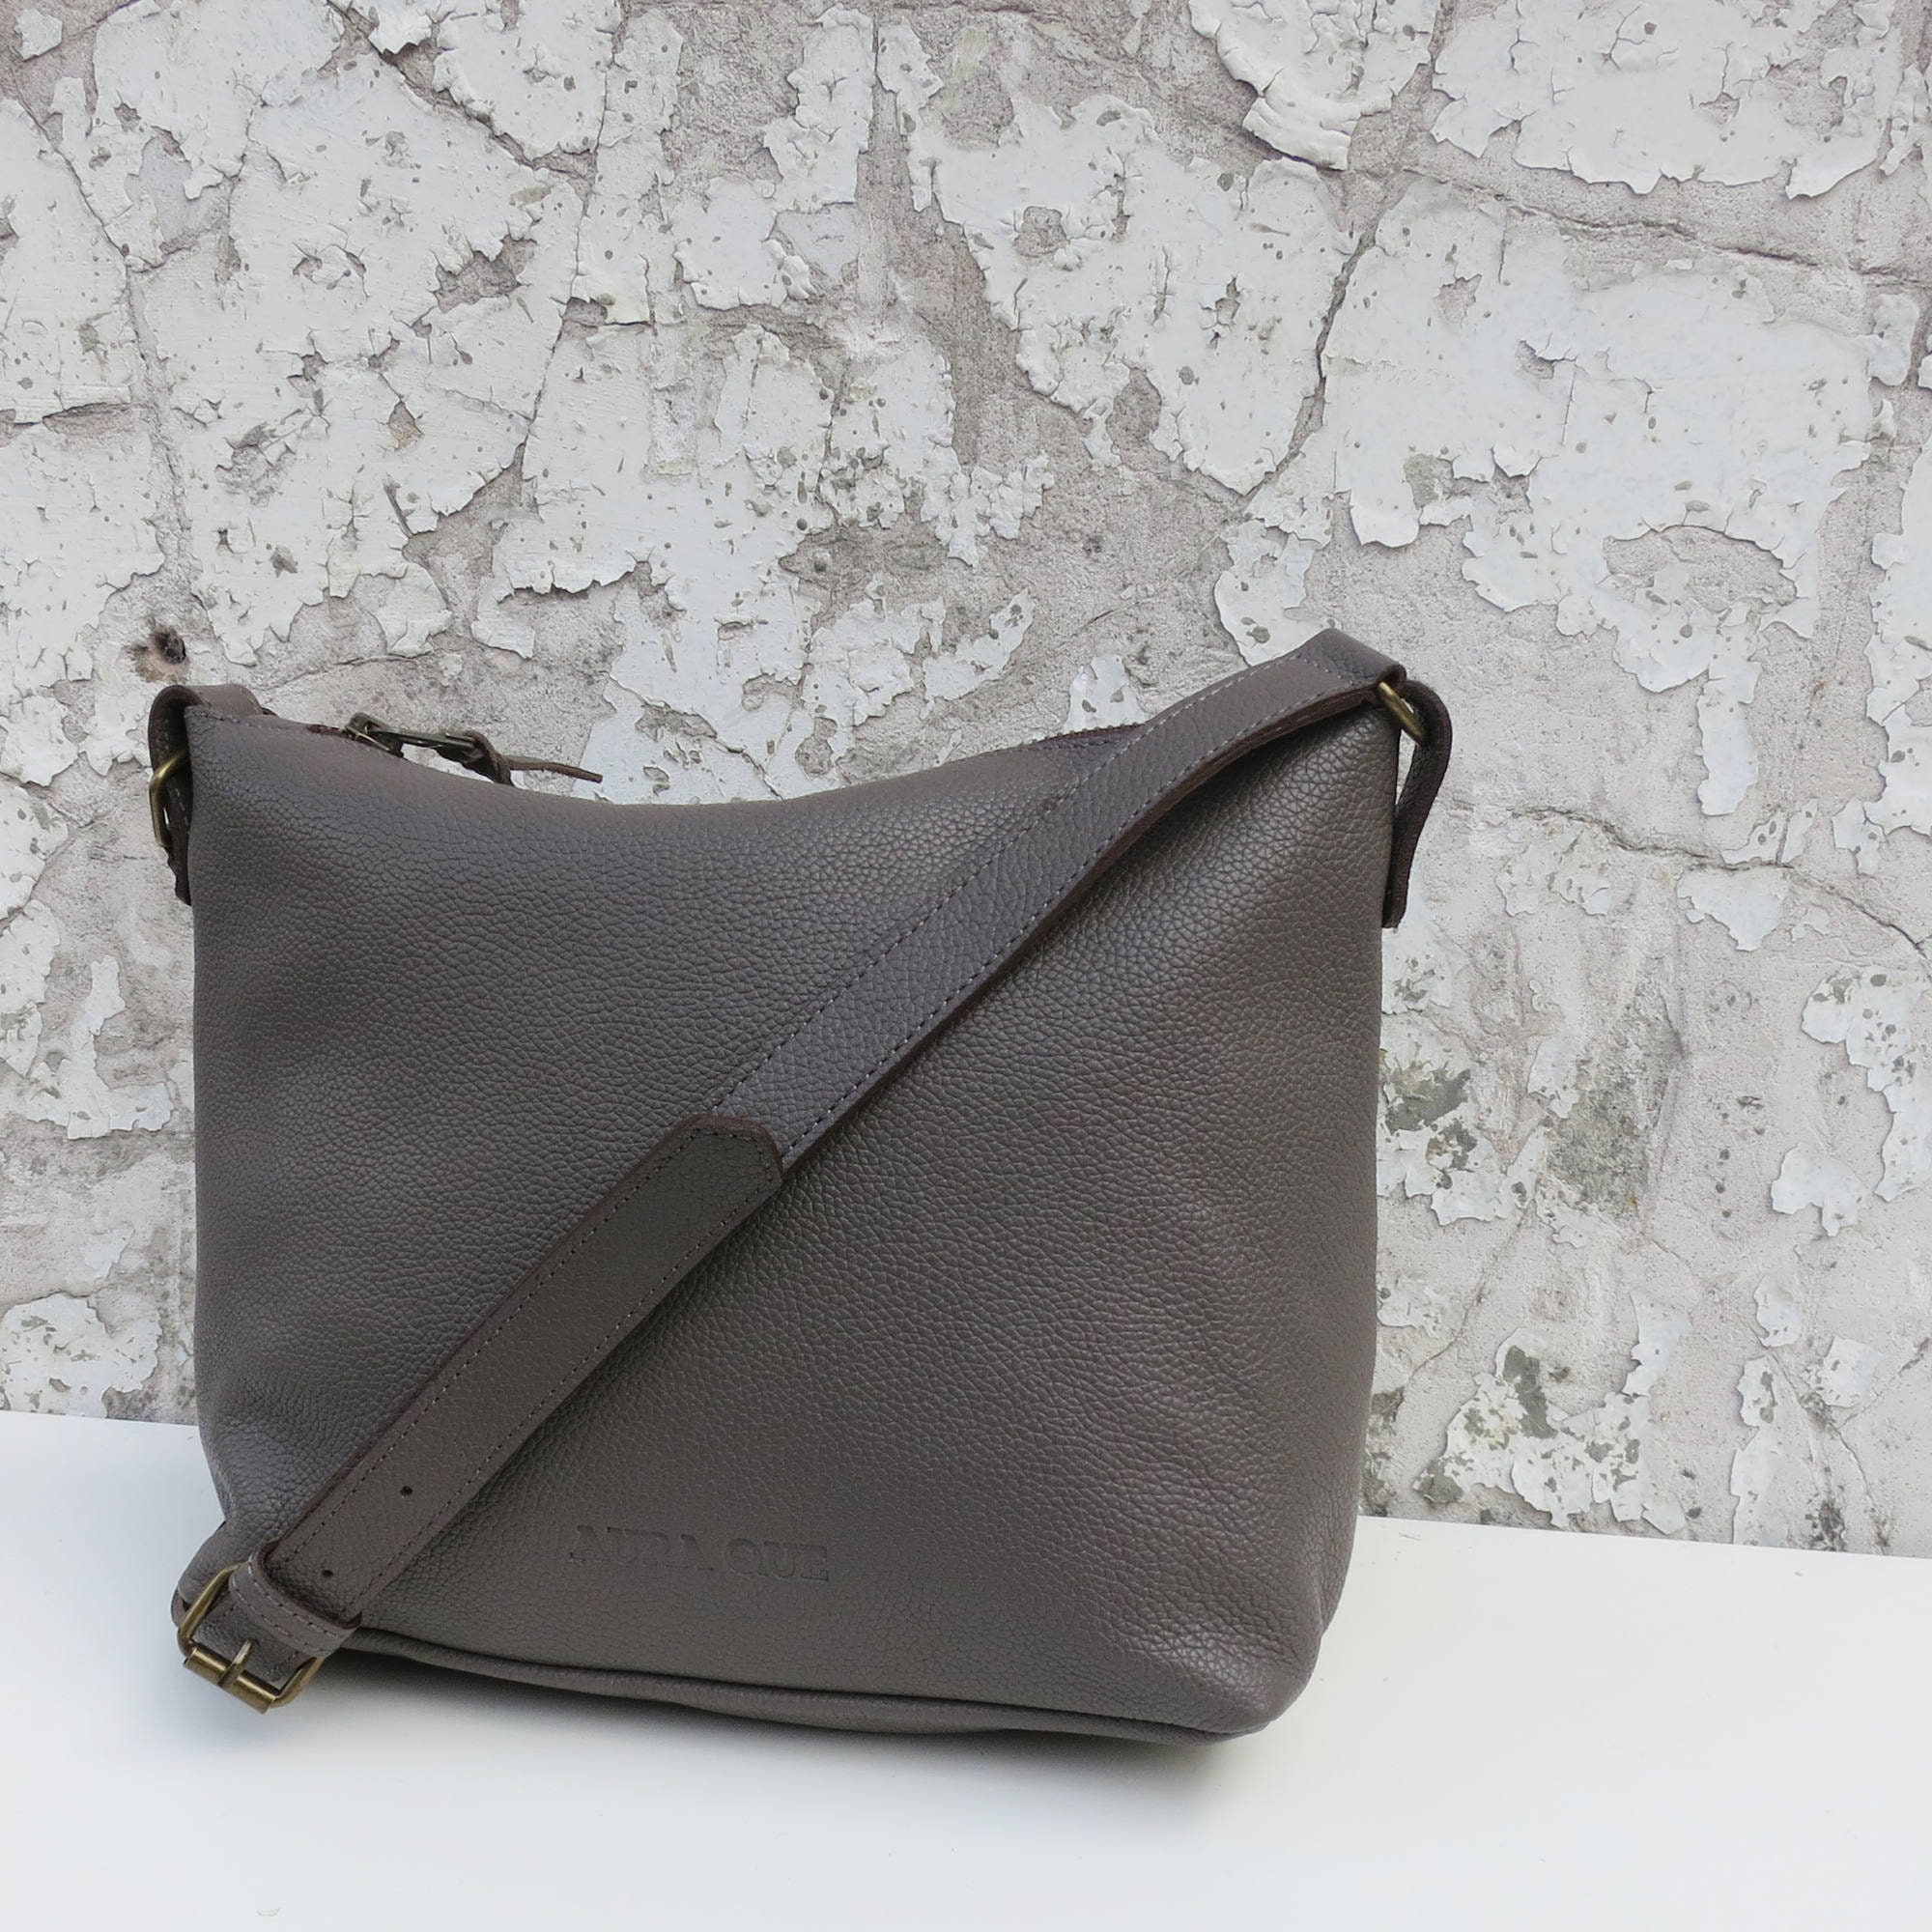 Fairtrade Handmade Classic Leather Shoulder Bag  f3b309f787346